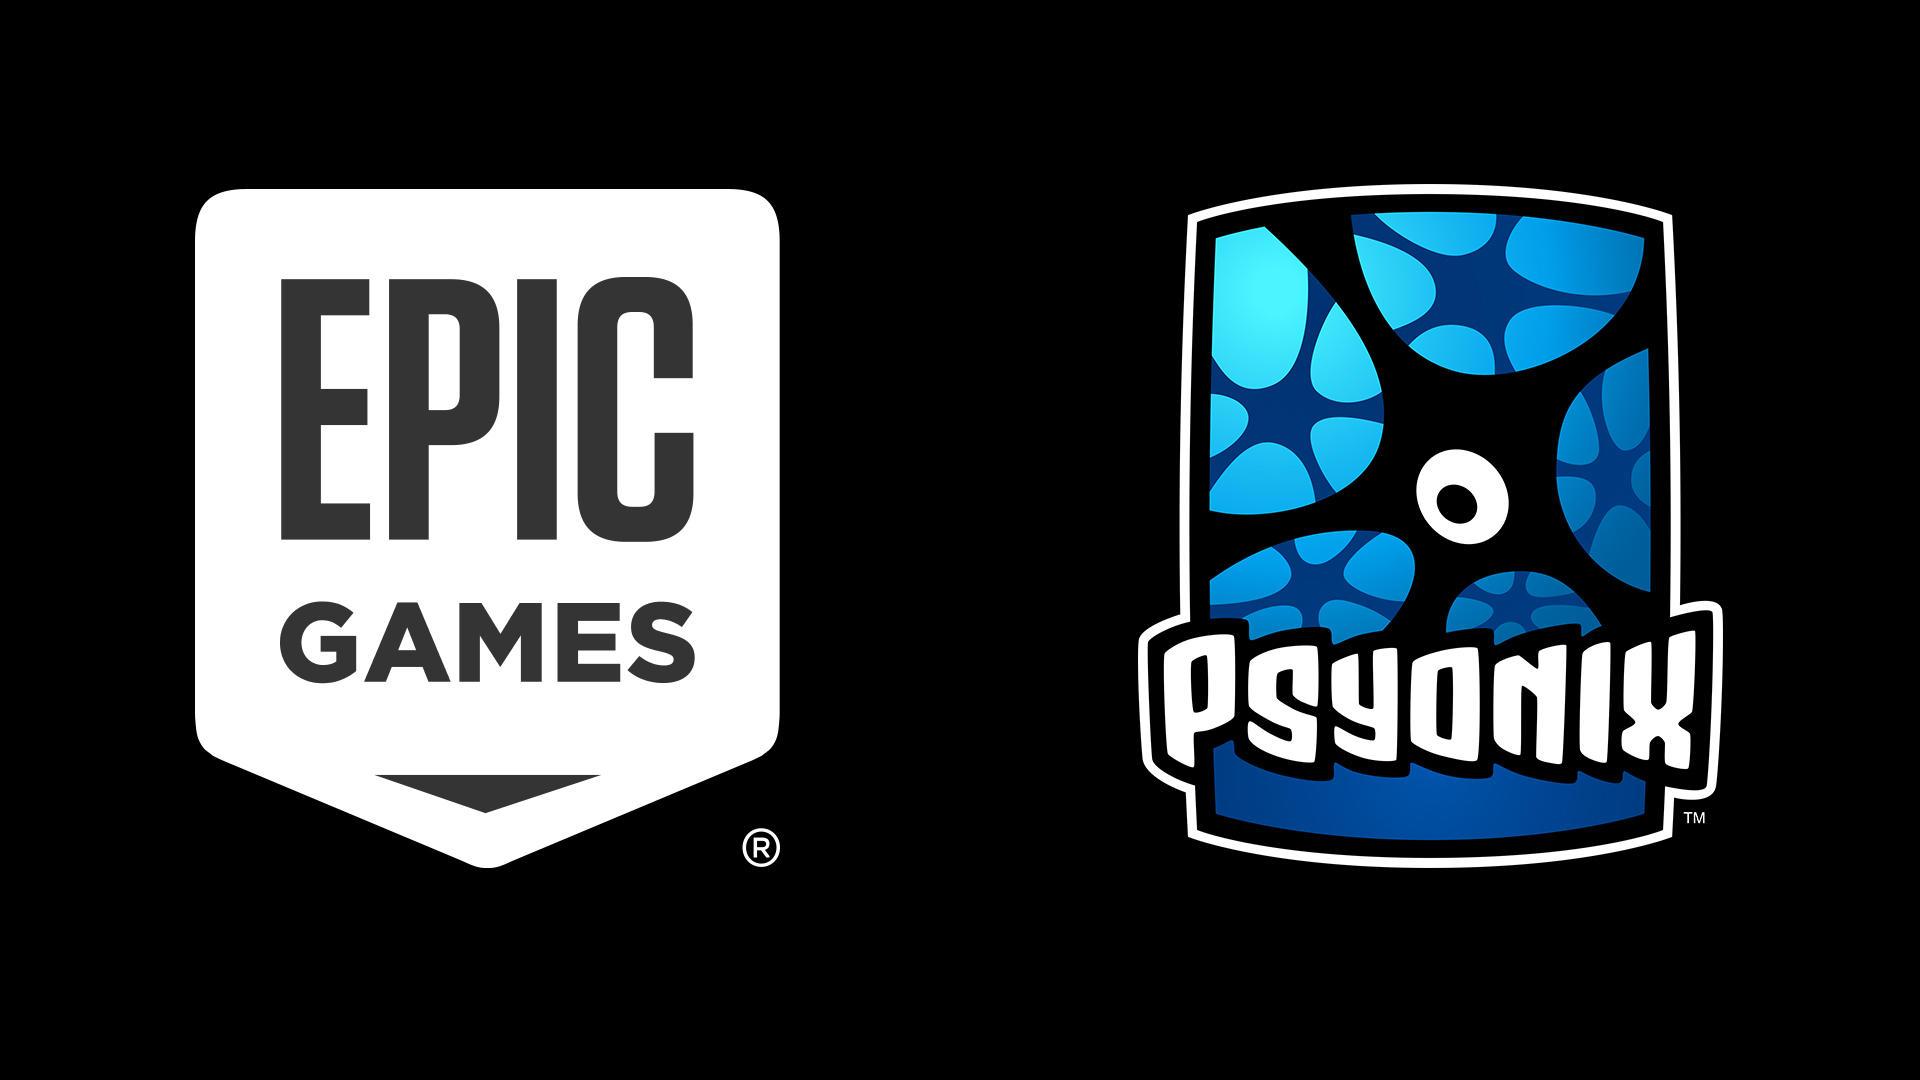 Epic Games acquista Psyonix